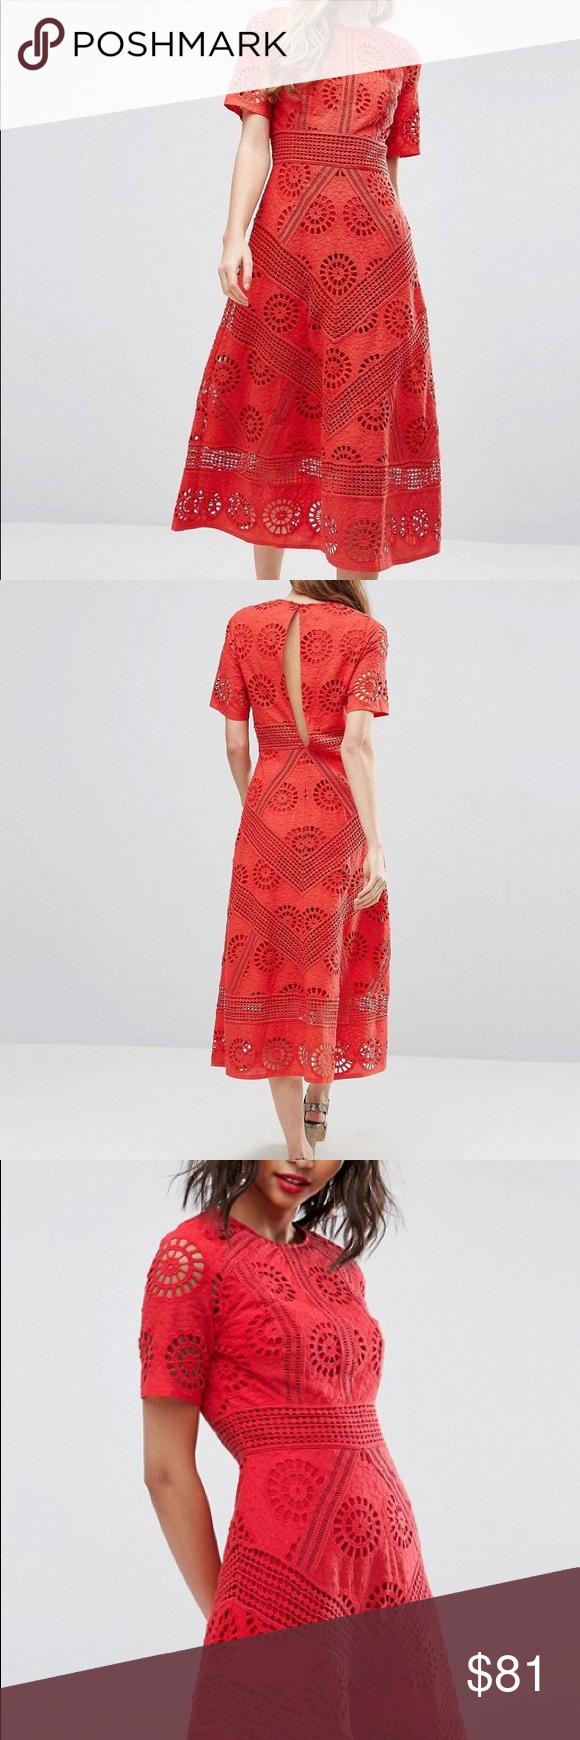 710a9e3850c ASOS PREMIUM Midi Dress in Broderie Fabric New